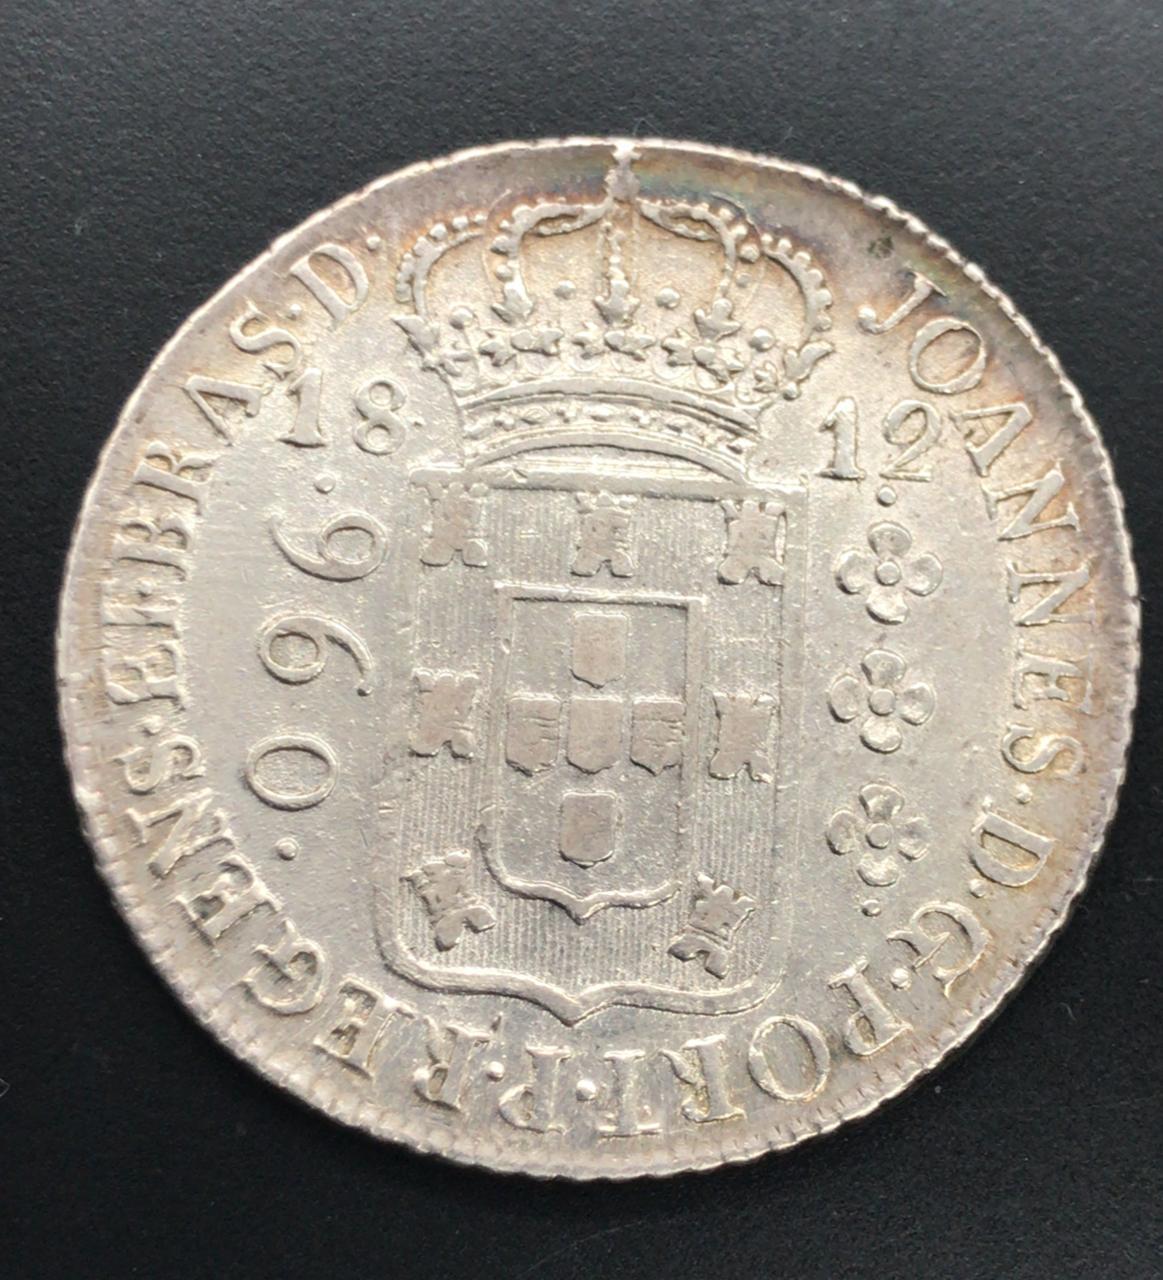 960 REIS 1812 R